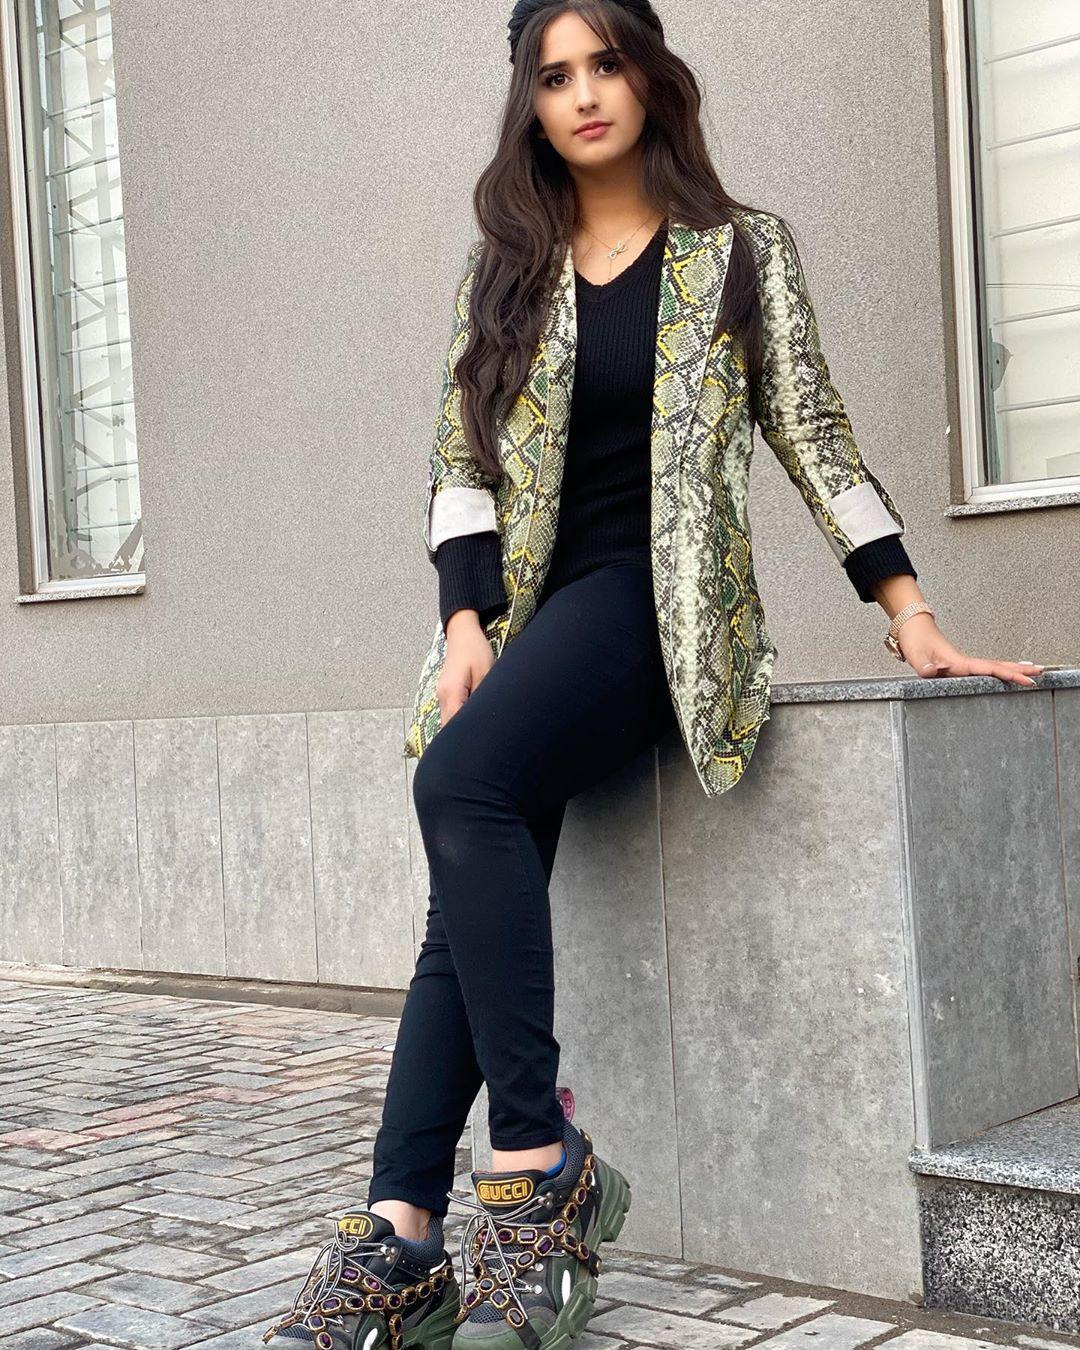 Alishbah Anjum jacket, blazer, jeans outfit